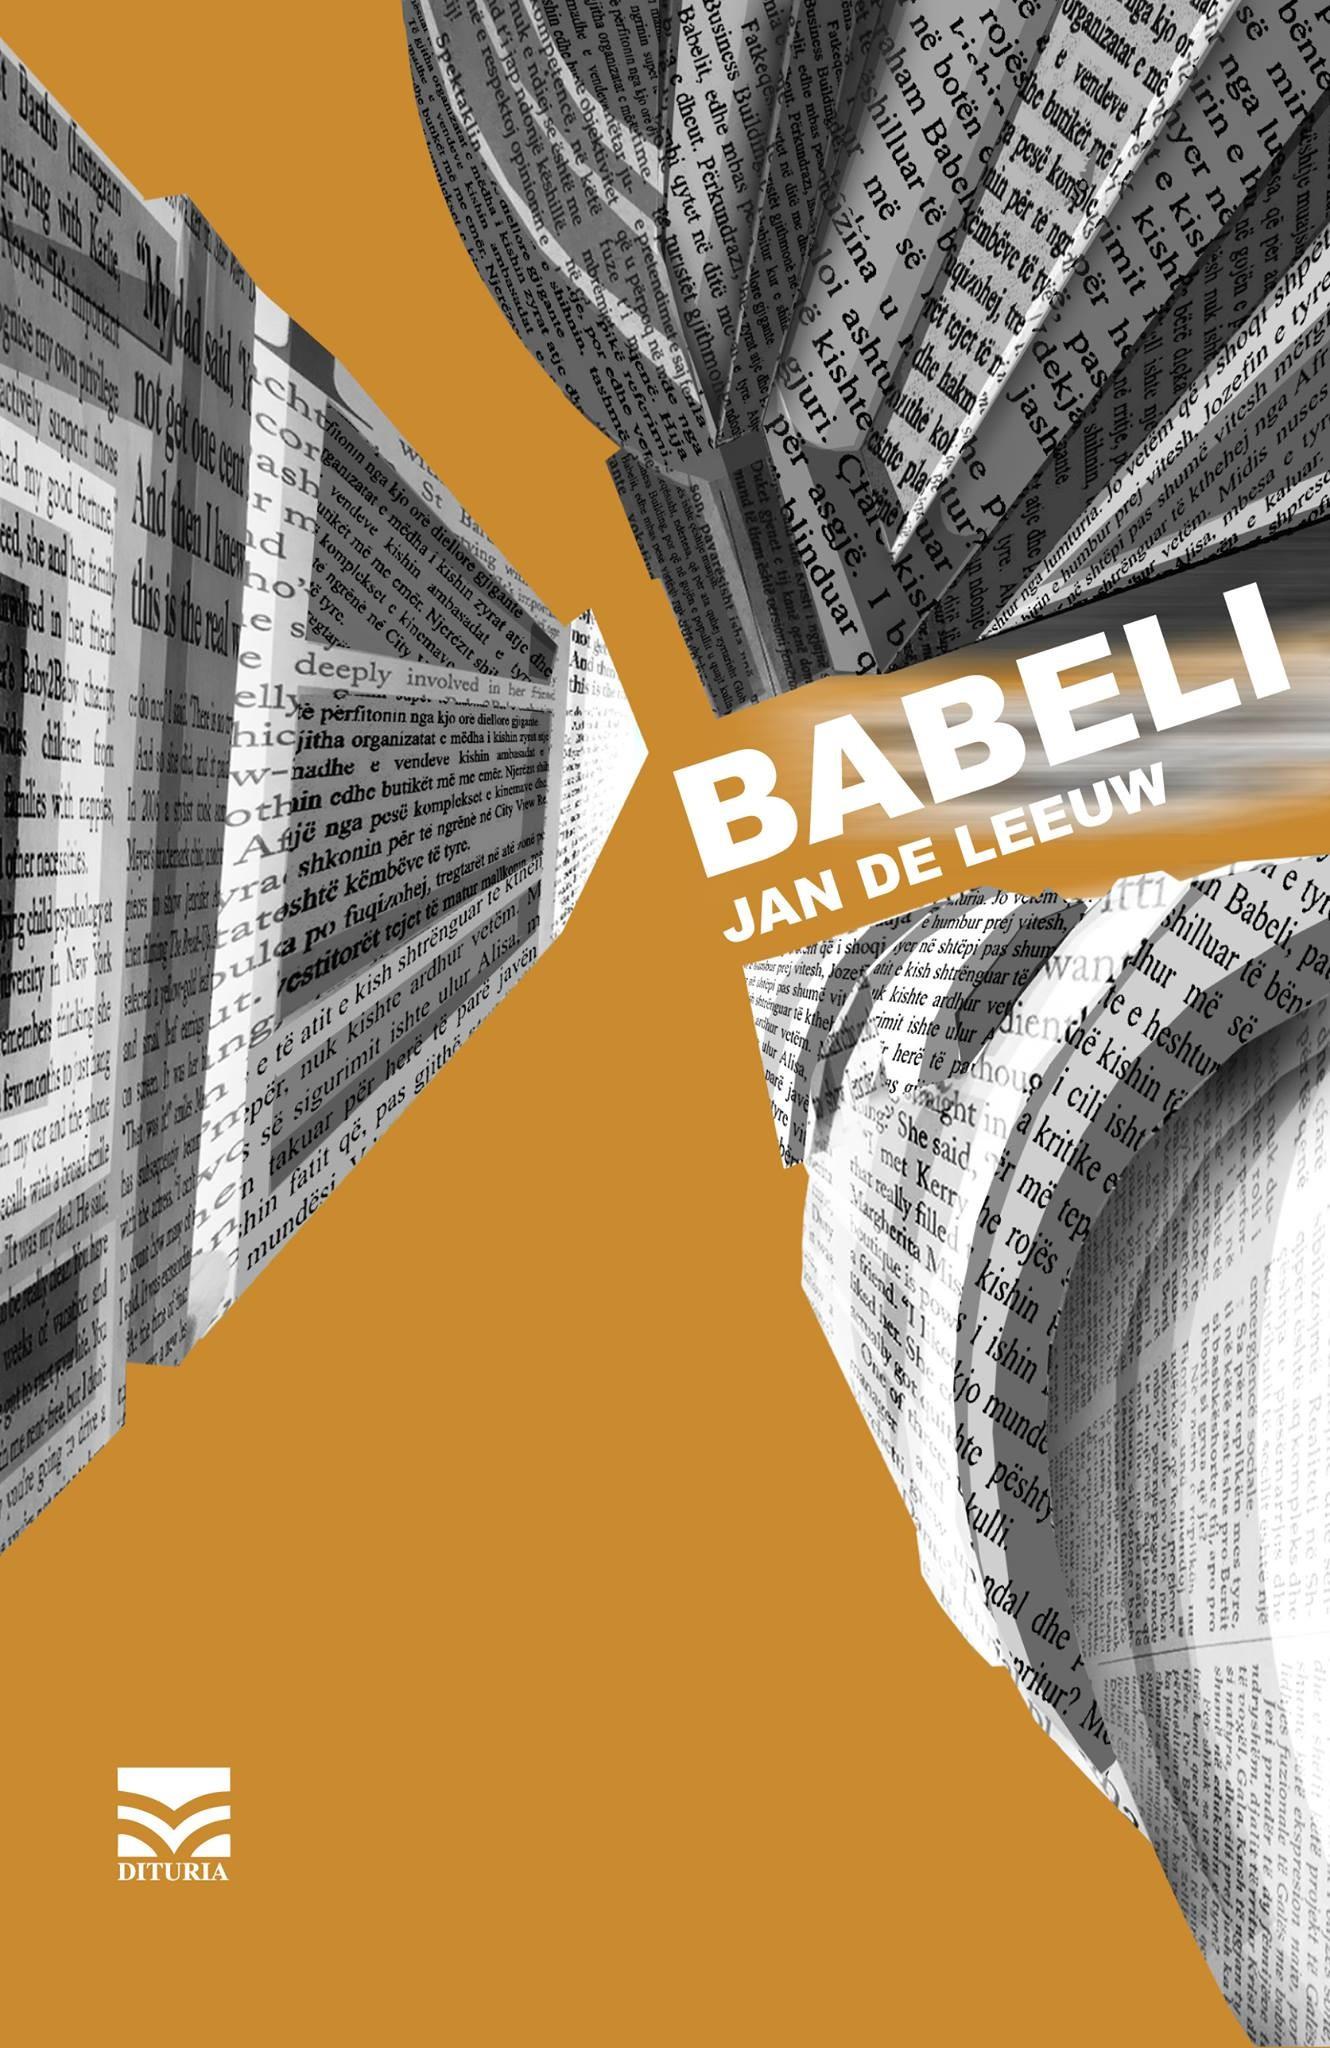 Babeli